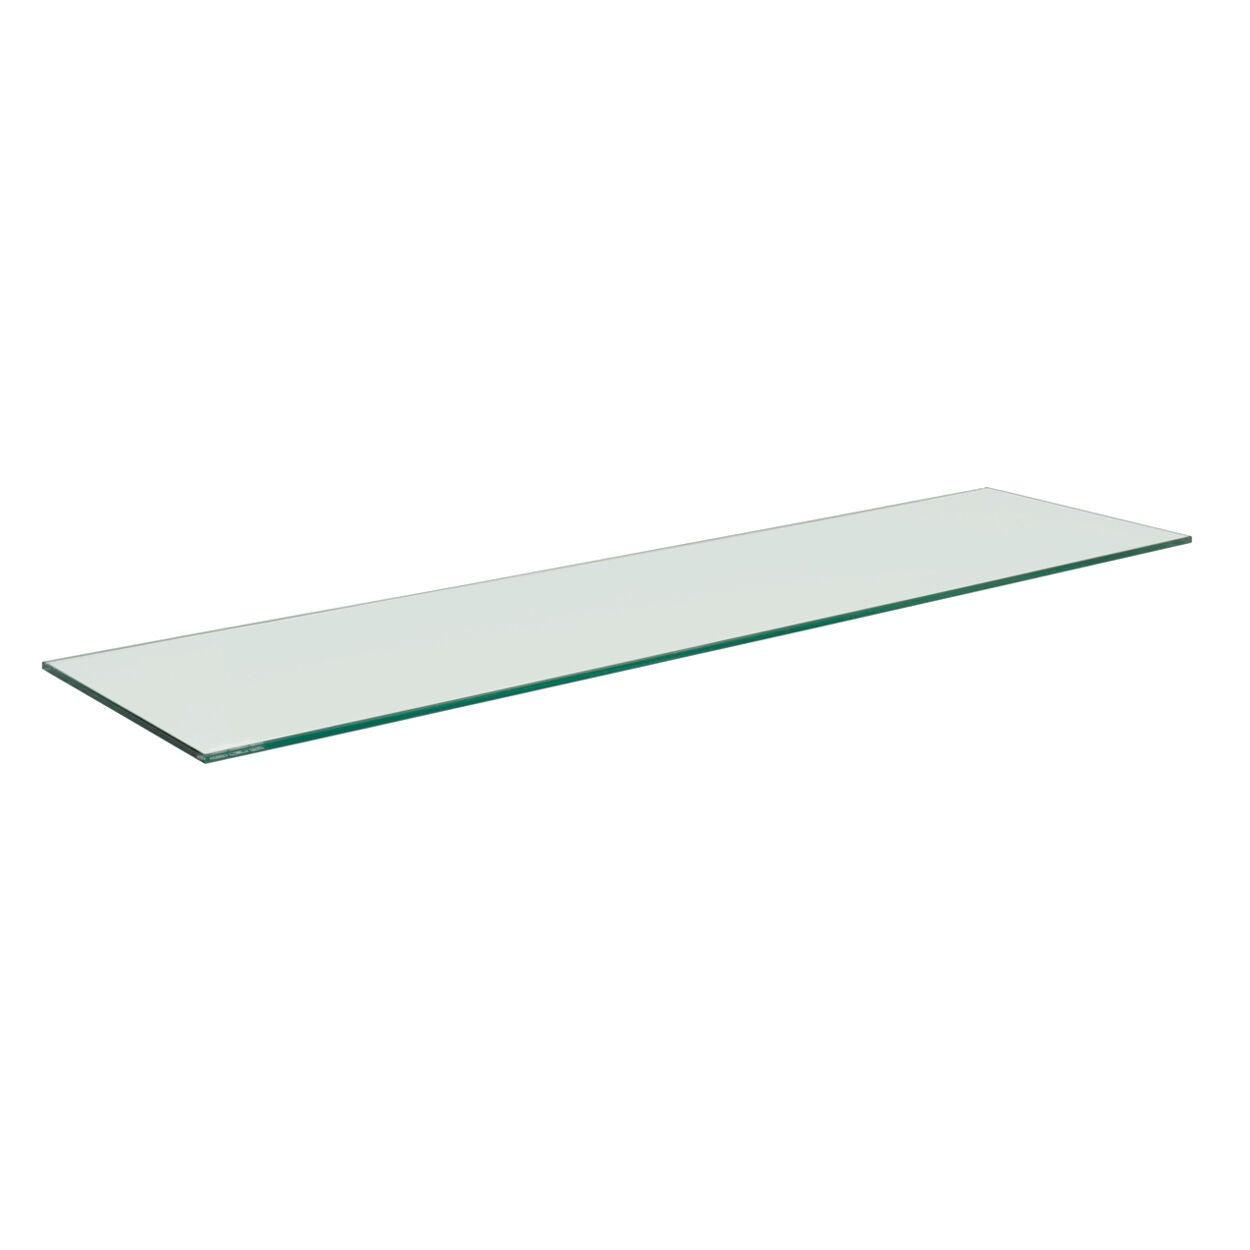 Glass Shelf, 8mm Toughened Glass, Choose size